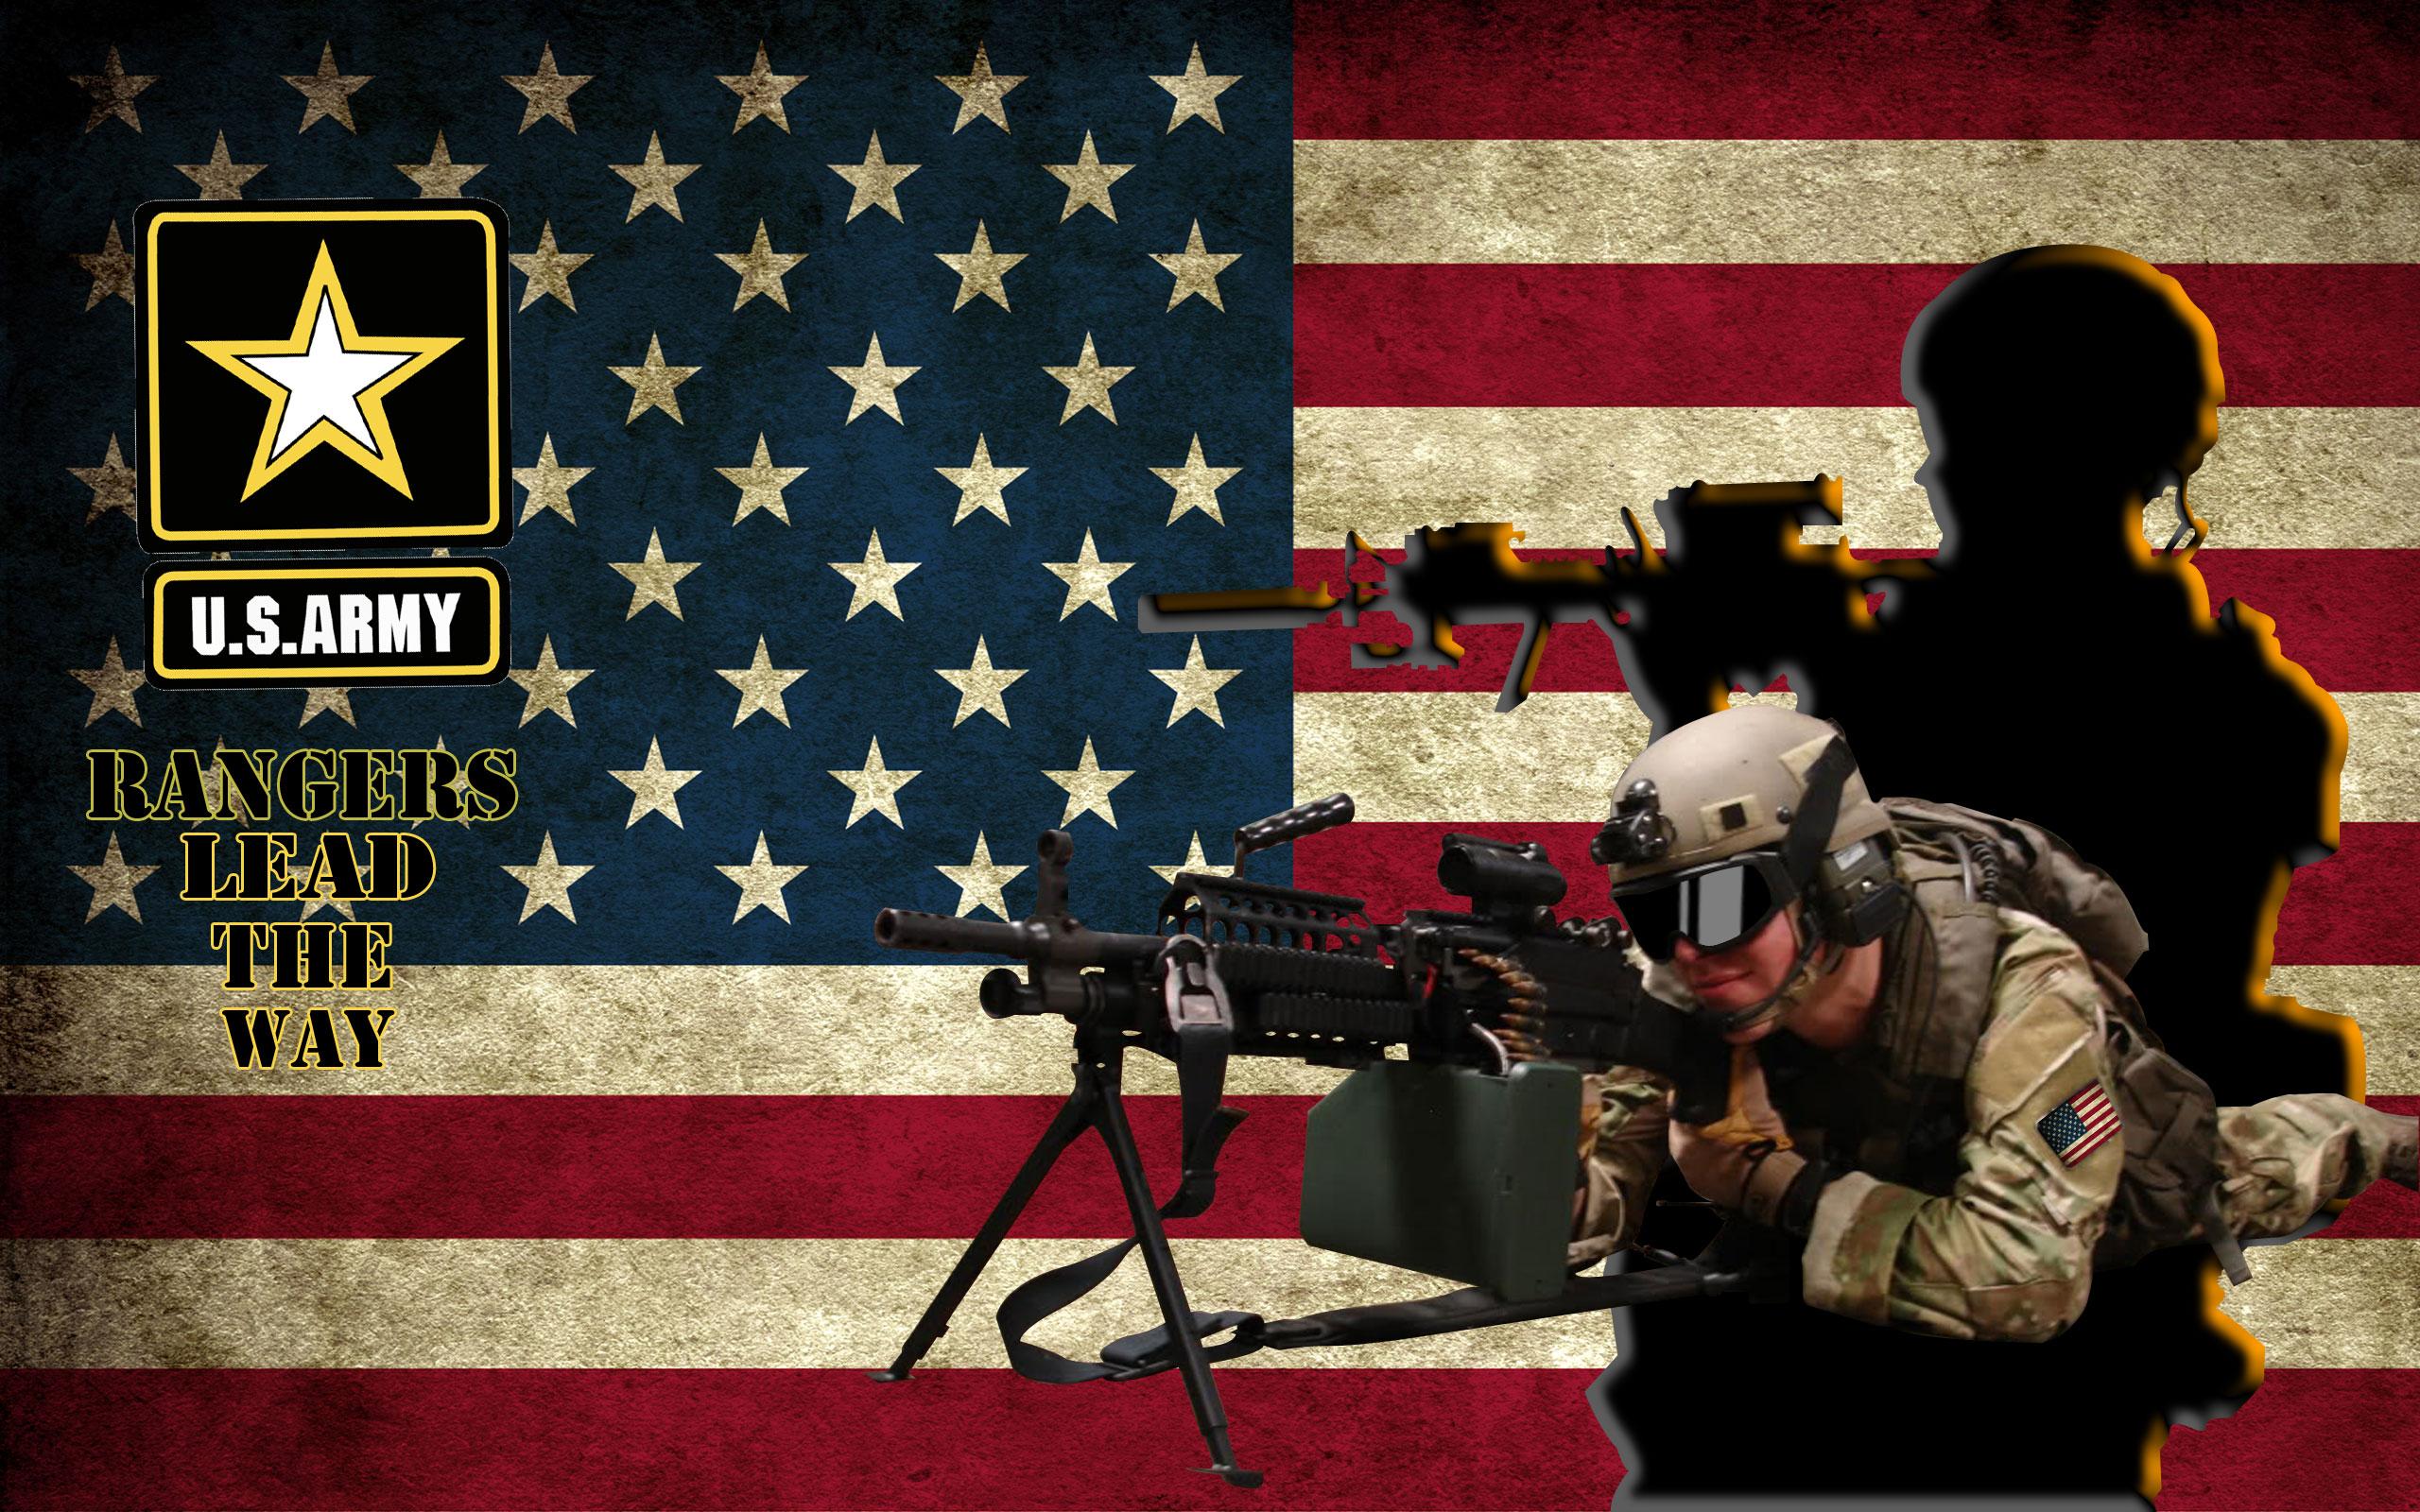 armorlessniperdeviantartcomartarmy rangers wallpaper 267457679 2560x1600